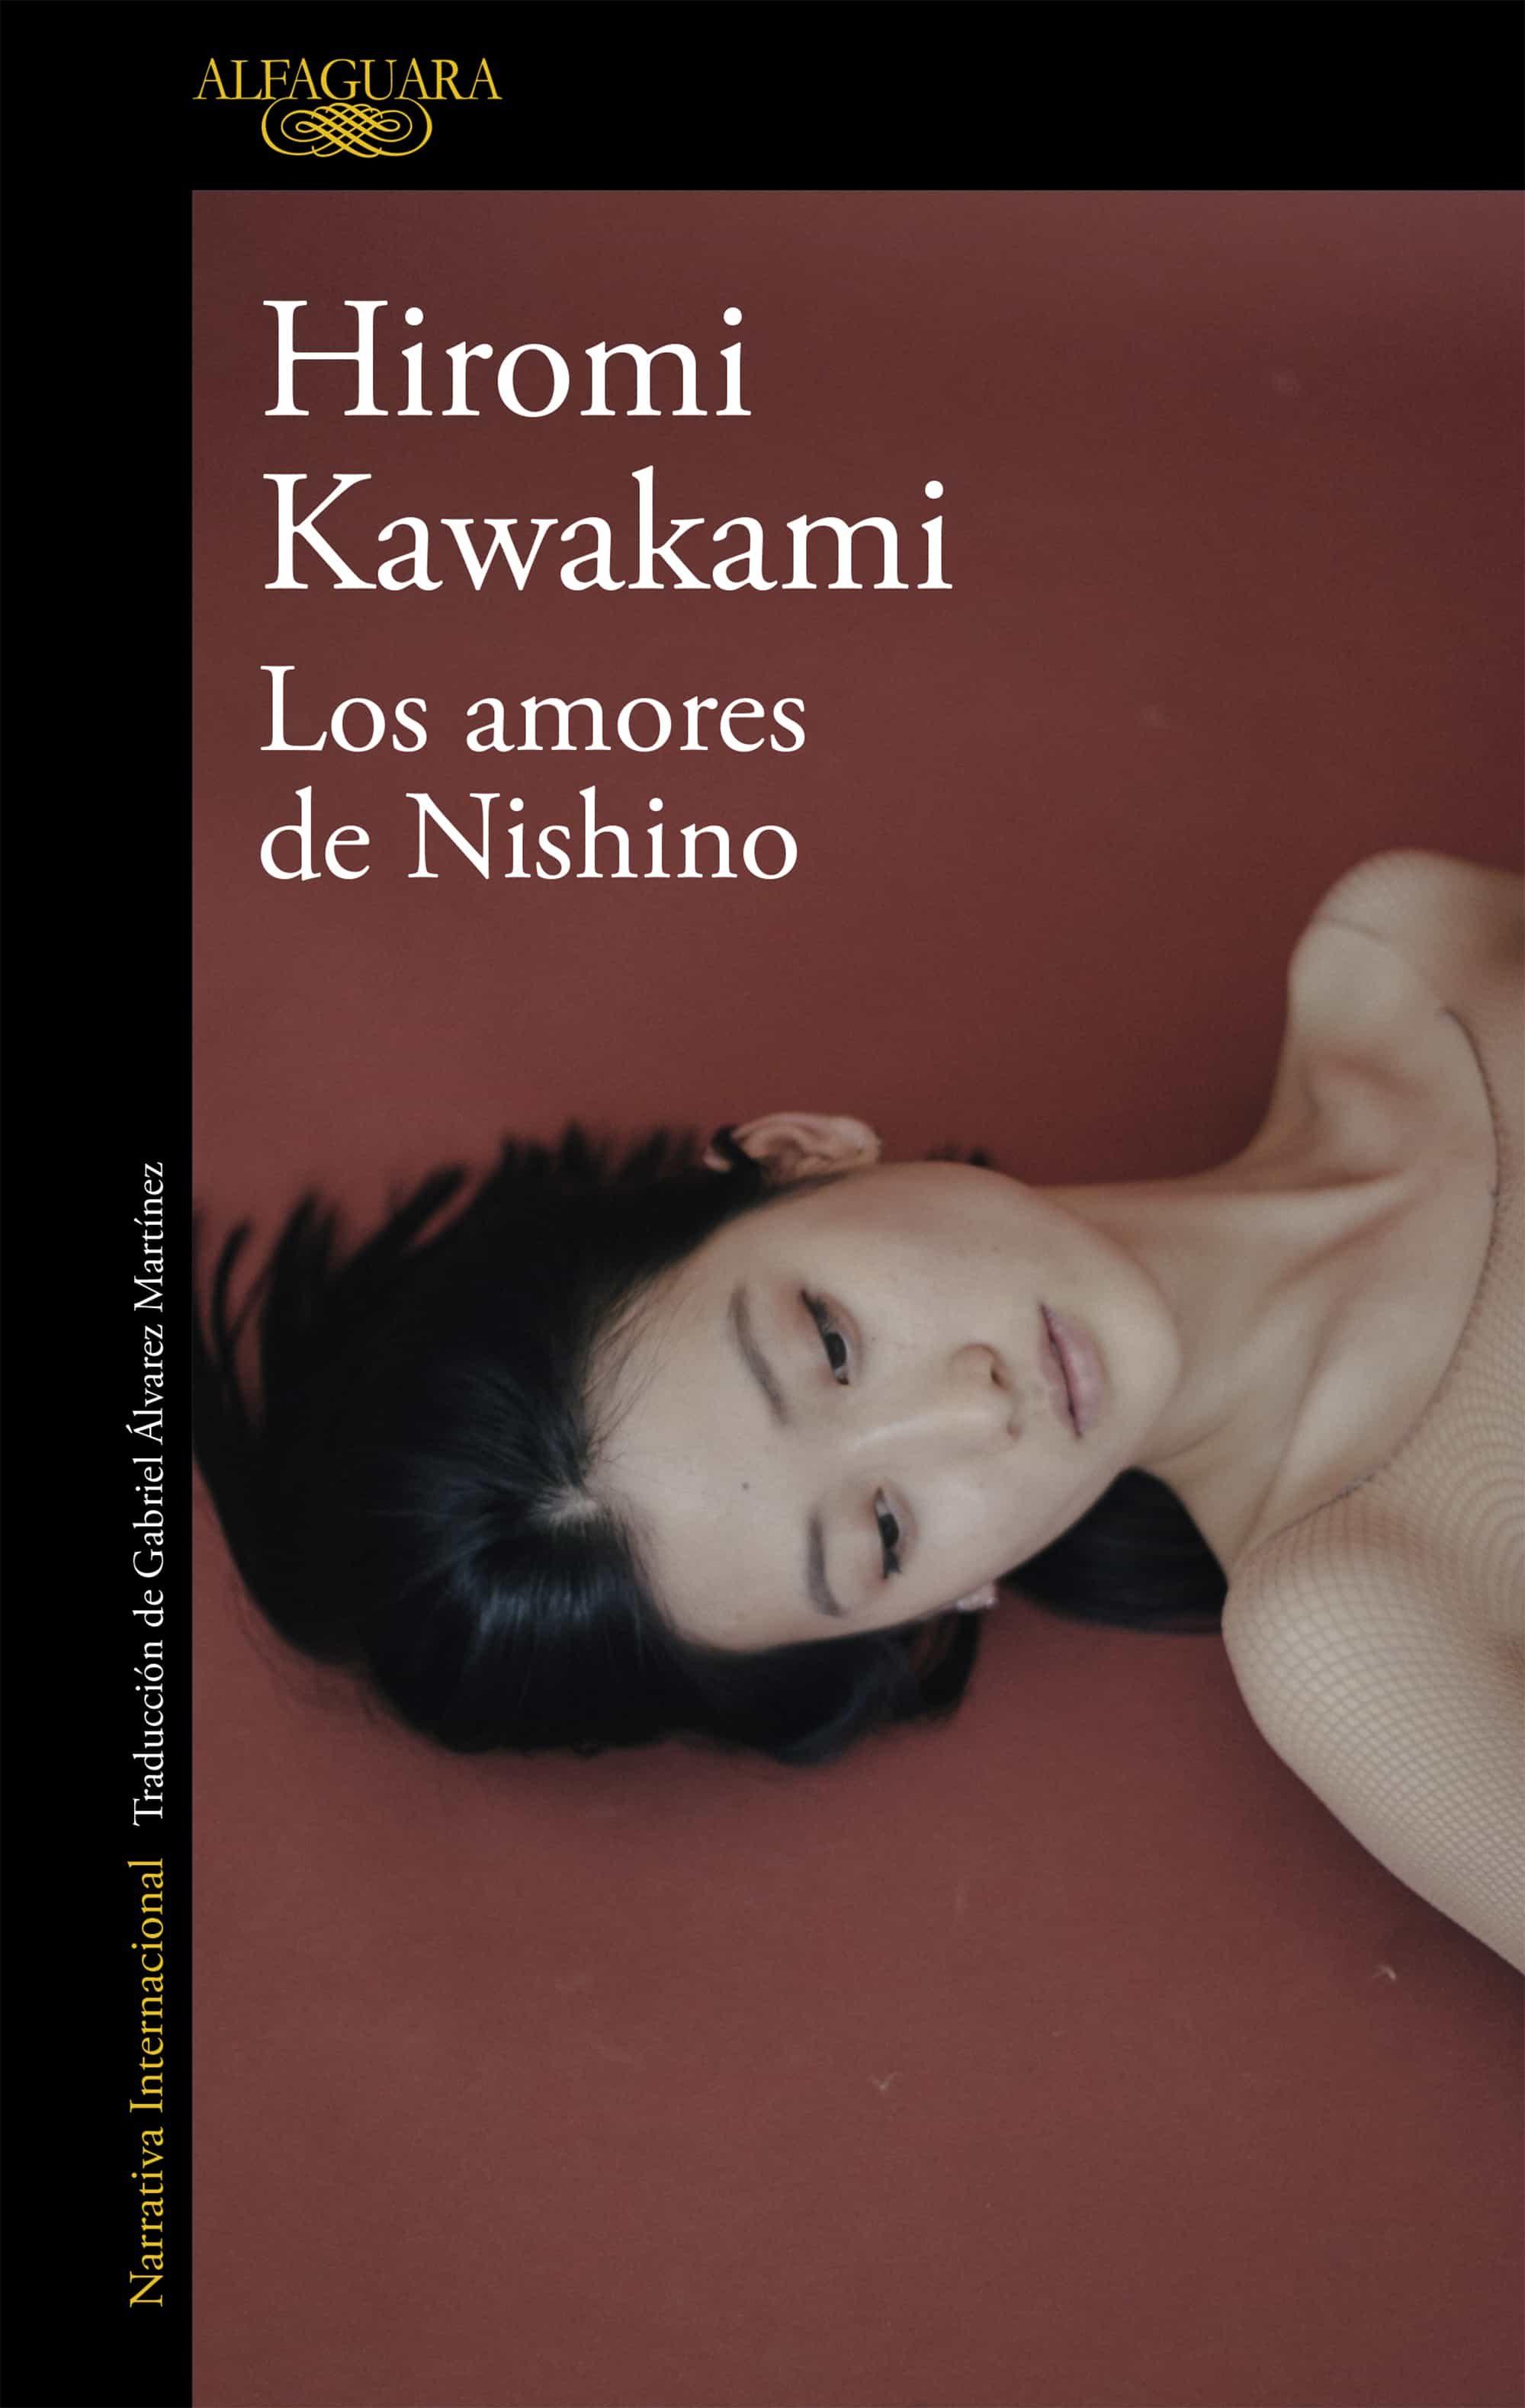 Los Amores De Nishino - Kawakami Hiromi